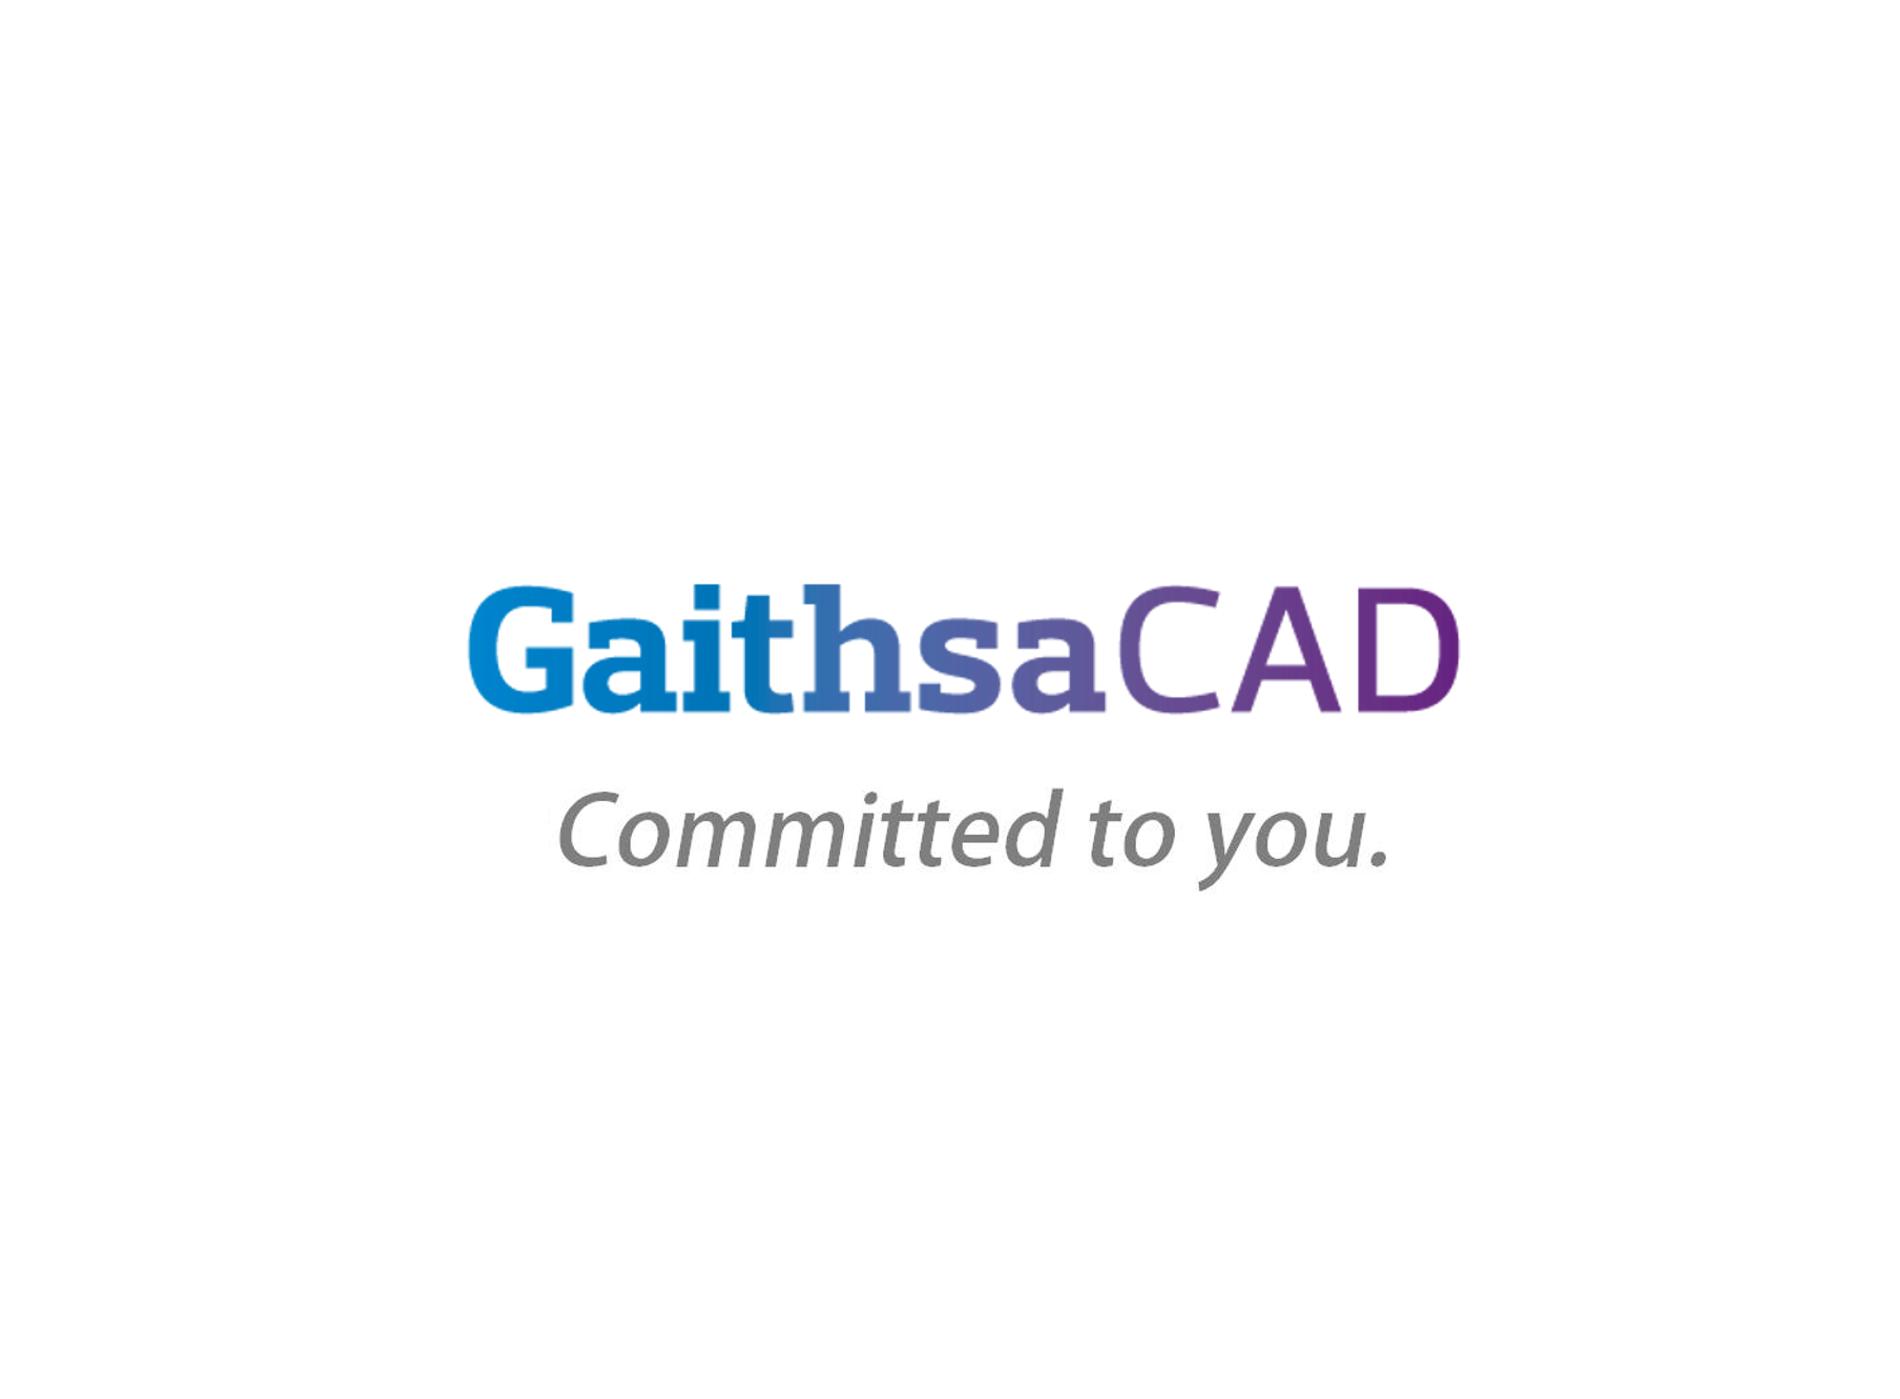 Gaithsacad